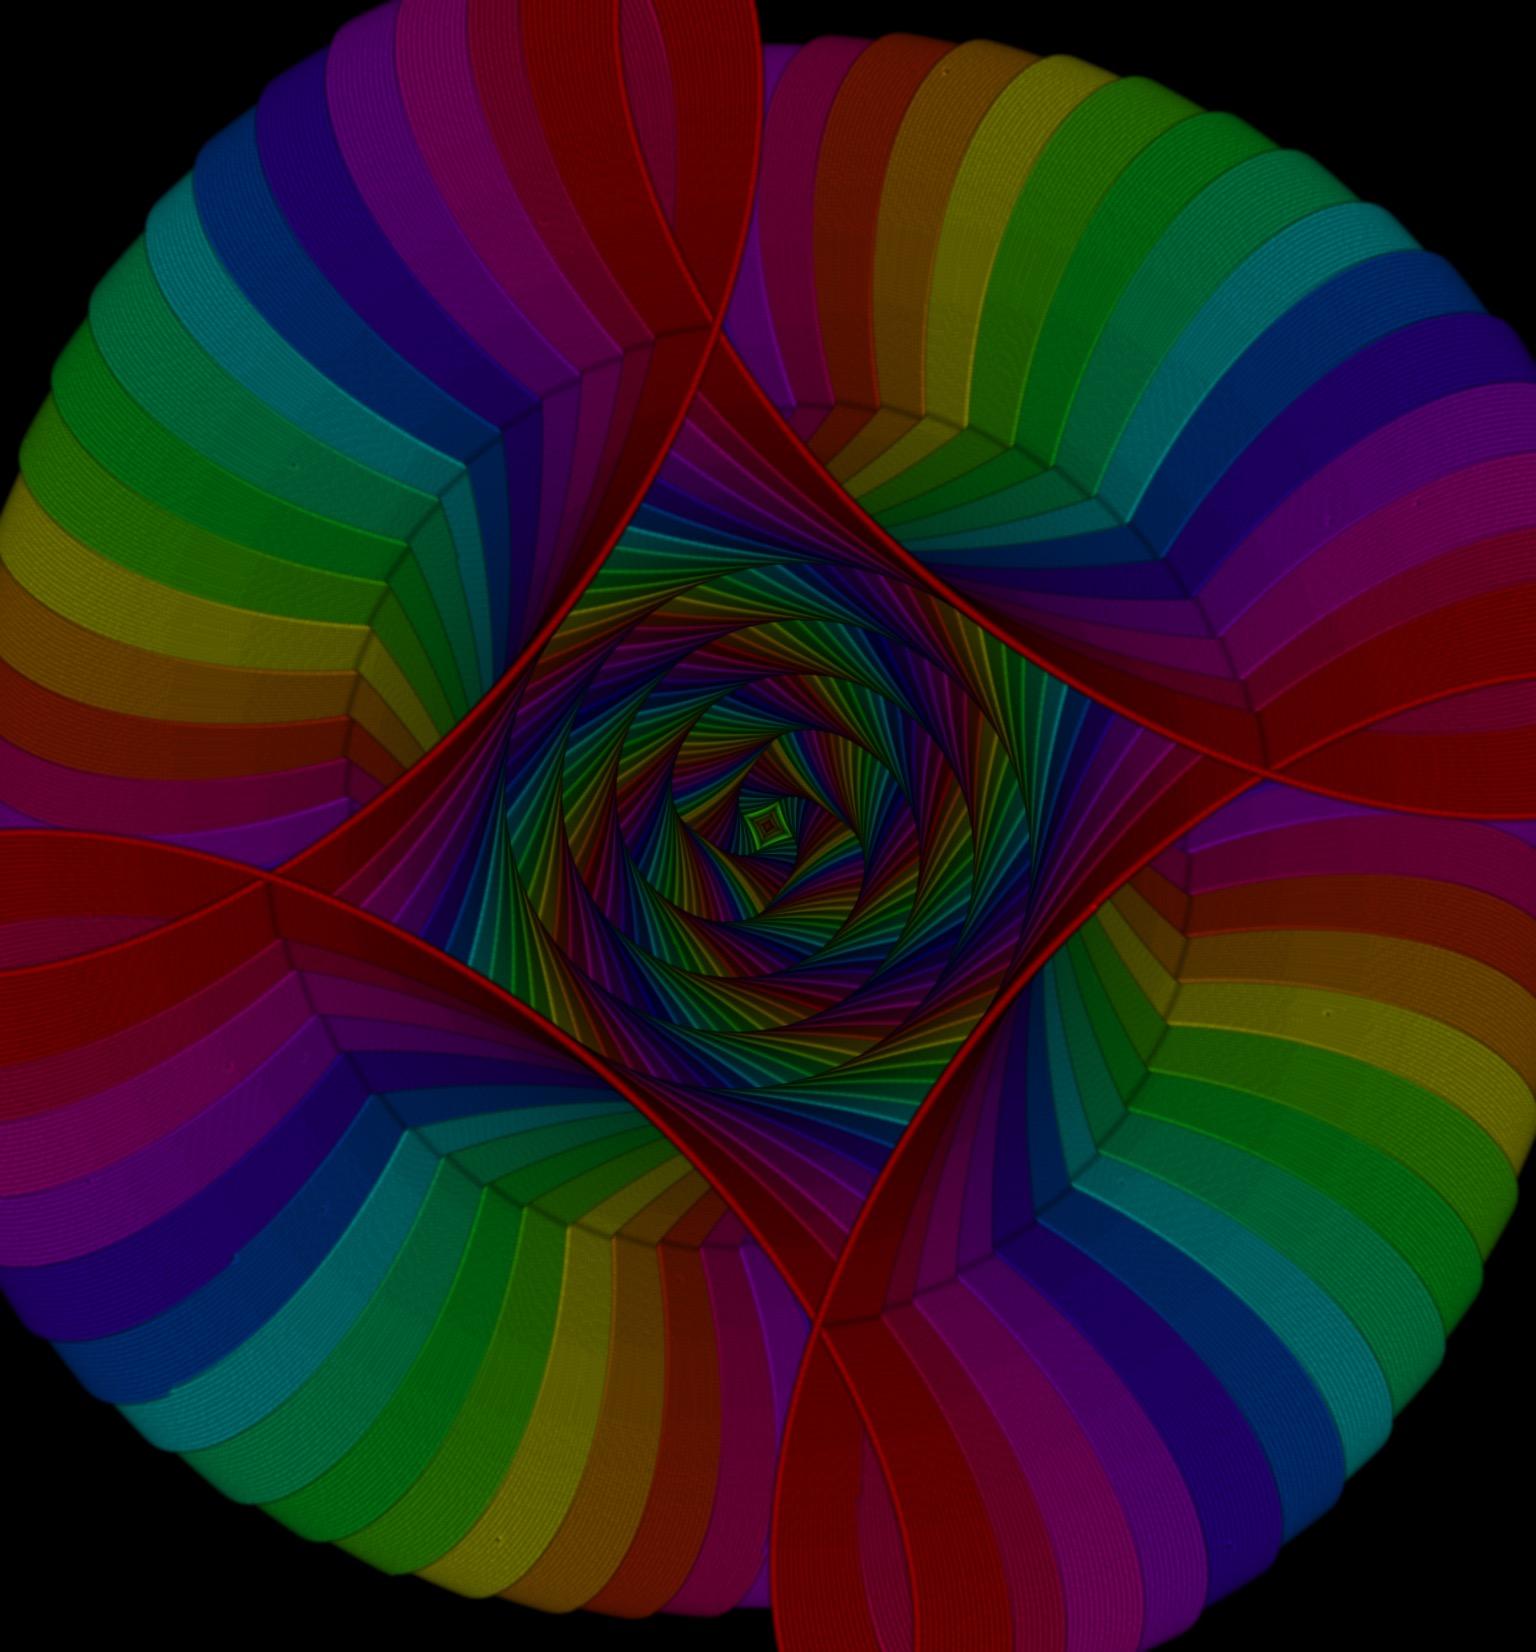 Spiro image #1 <type> rainbow_image <taken from> Gironia (me)